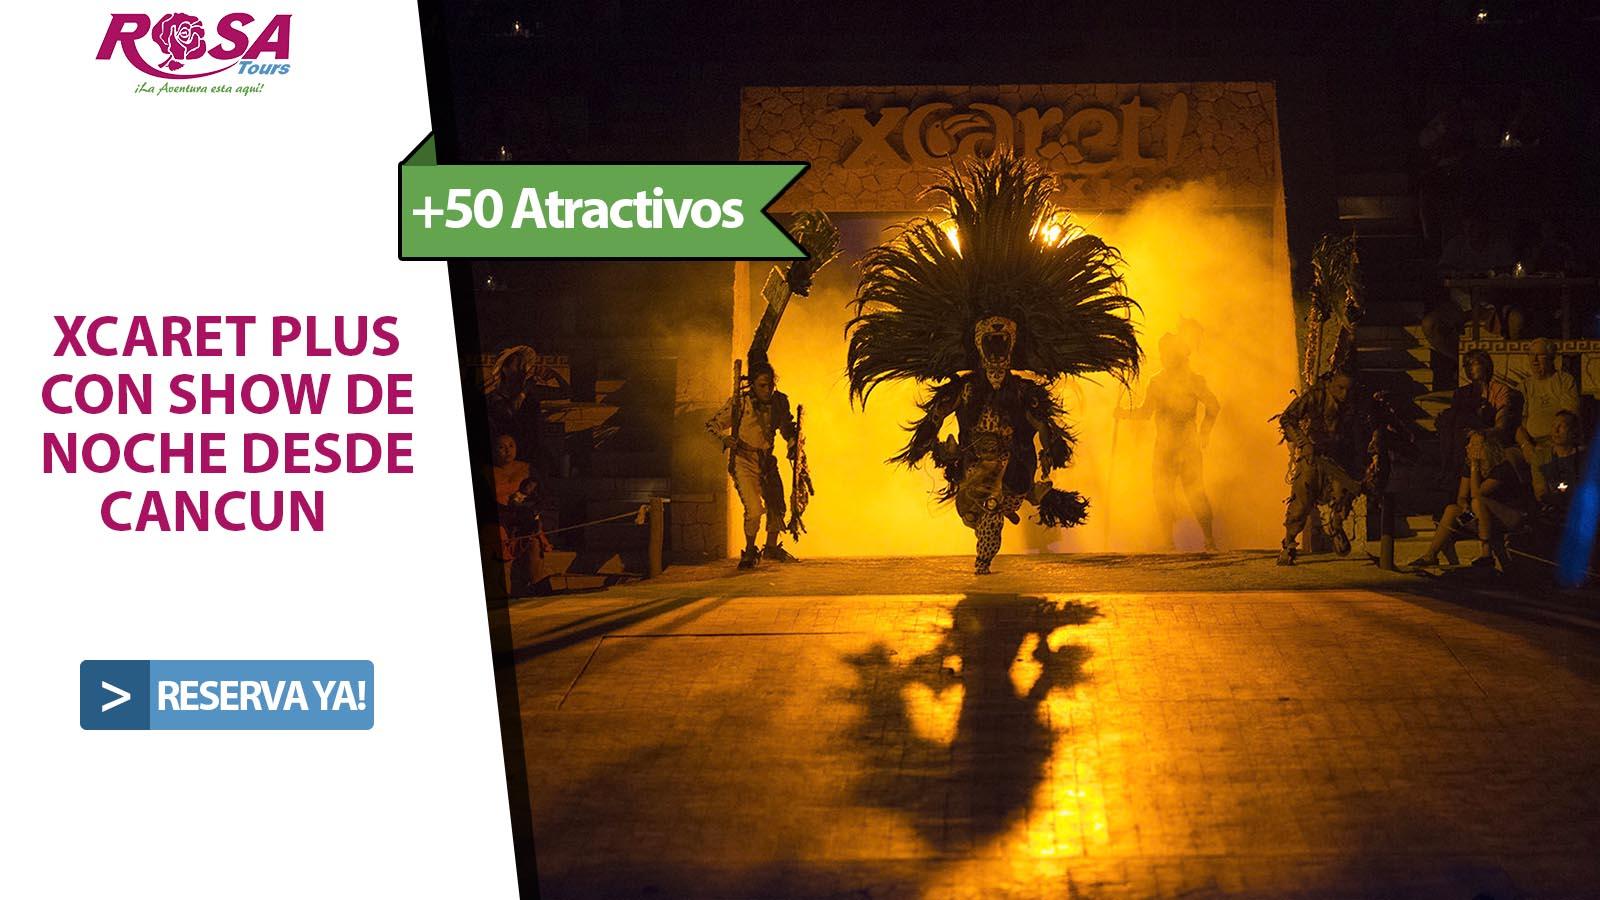 Xcaret Plus con Show de noche desde Cancún